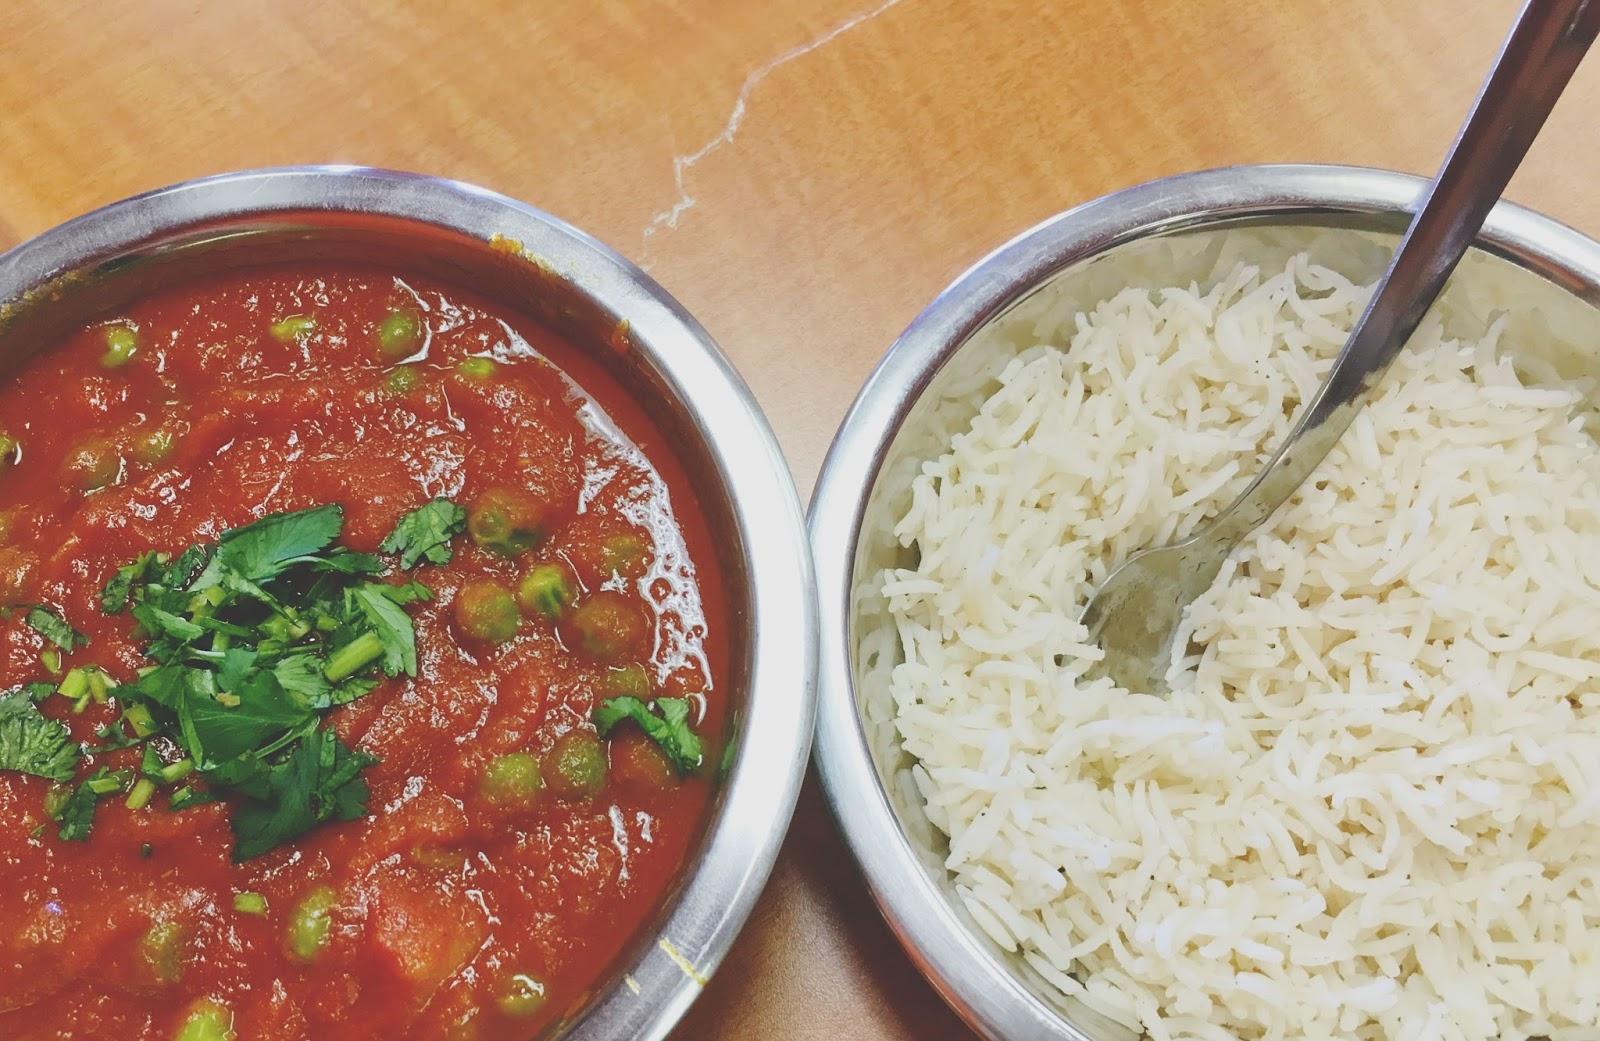 aloo matar at Curry Sultan - an Indian Restaurant near Houston, Texas